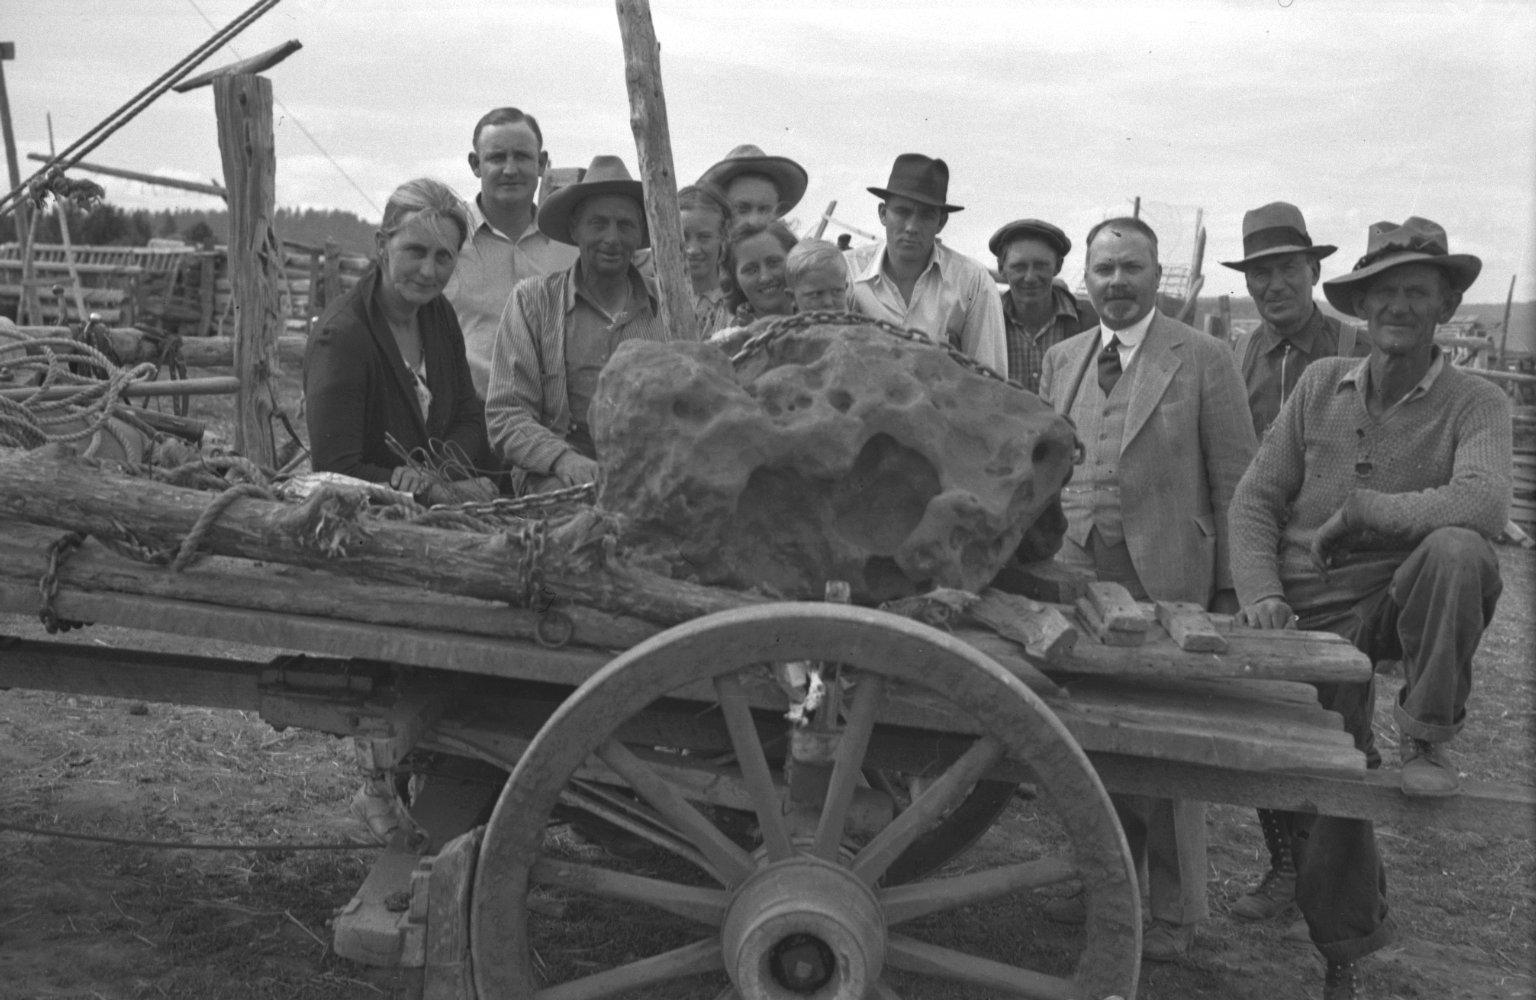 Crew gathered around loaded specimen